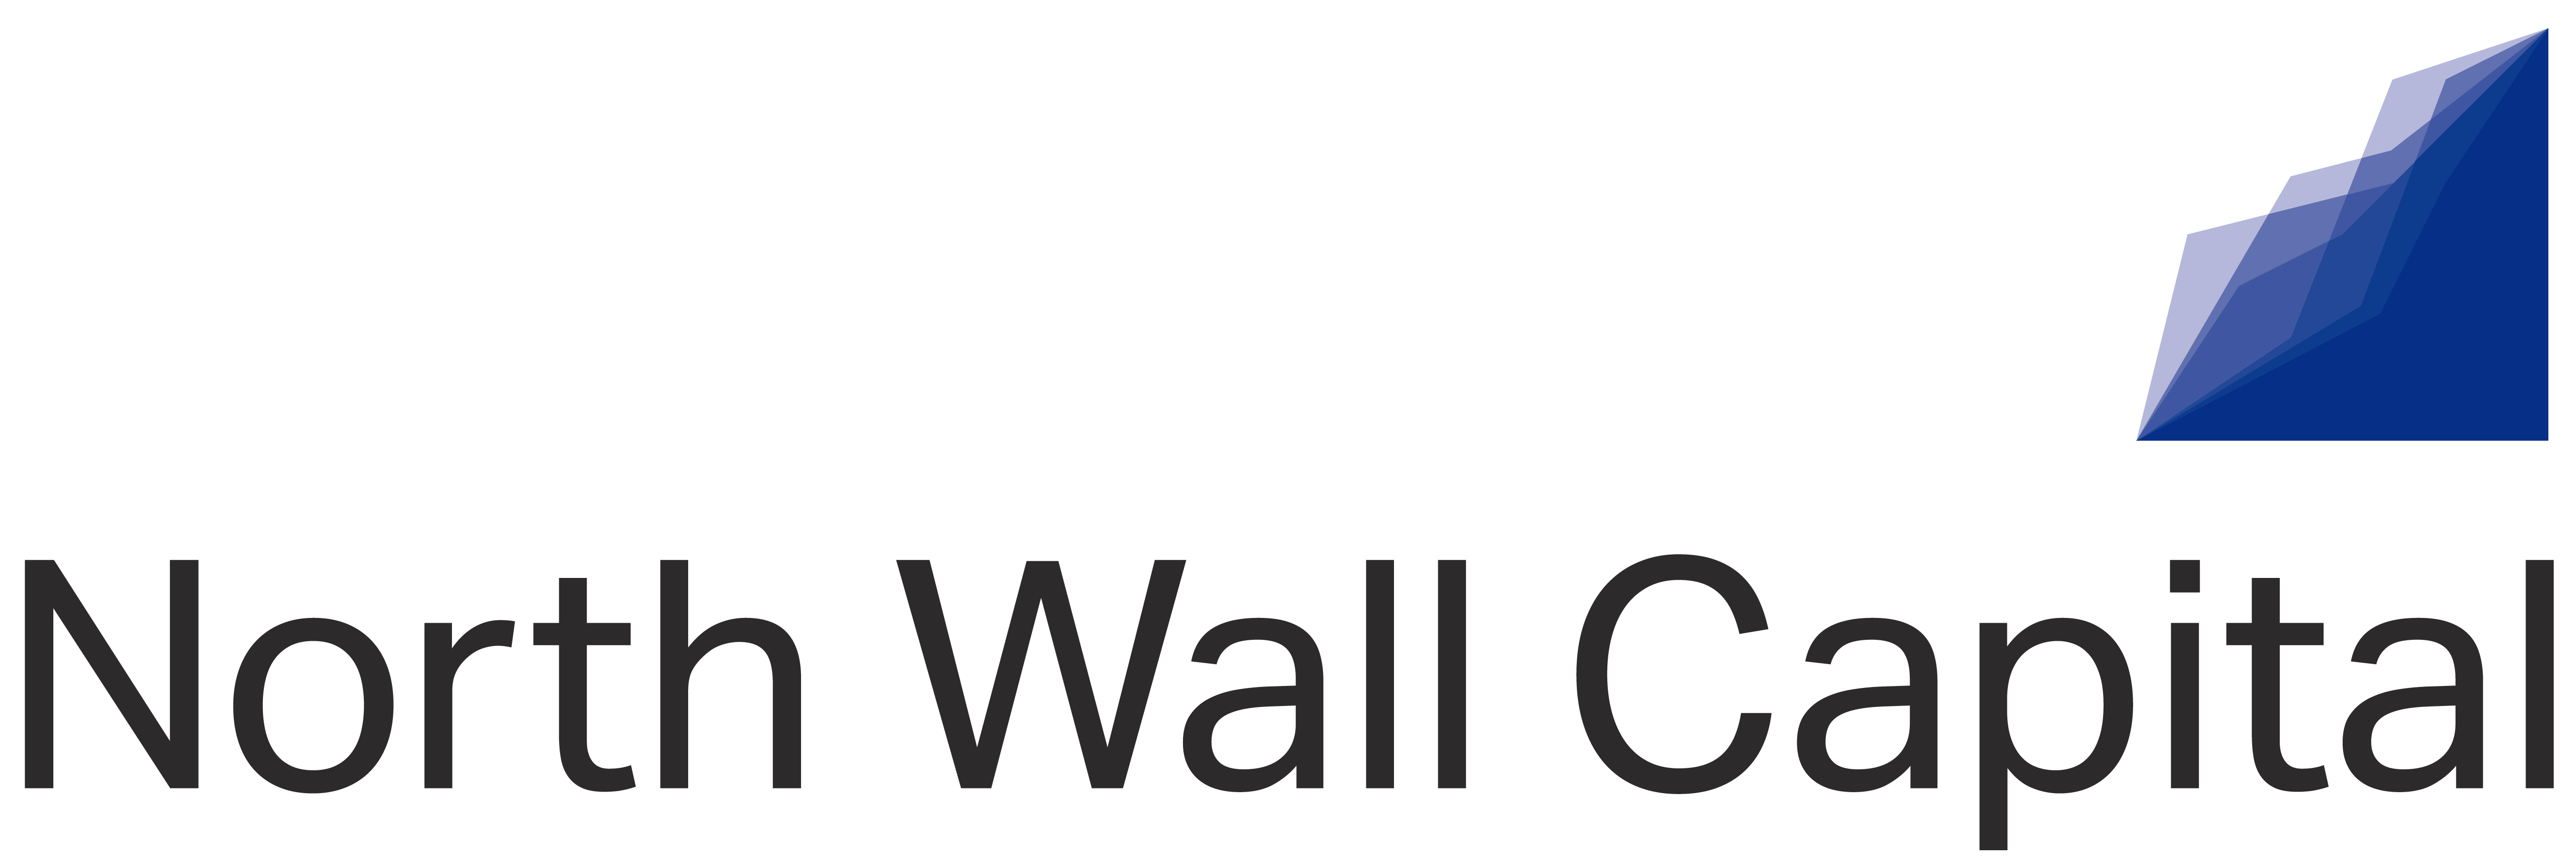 Logo zoomed